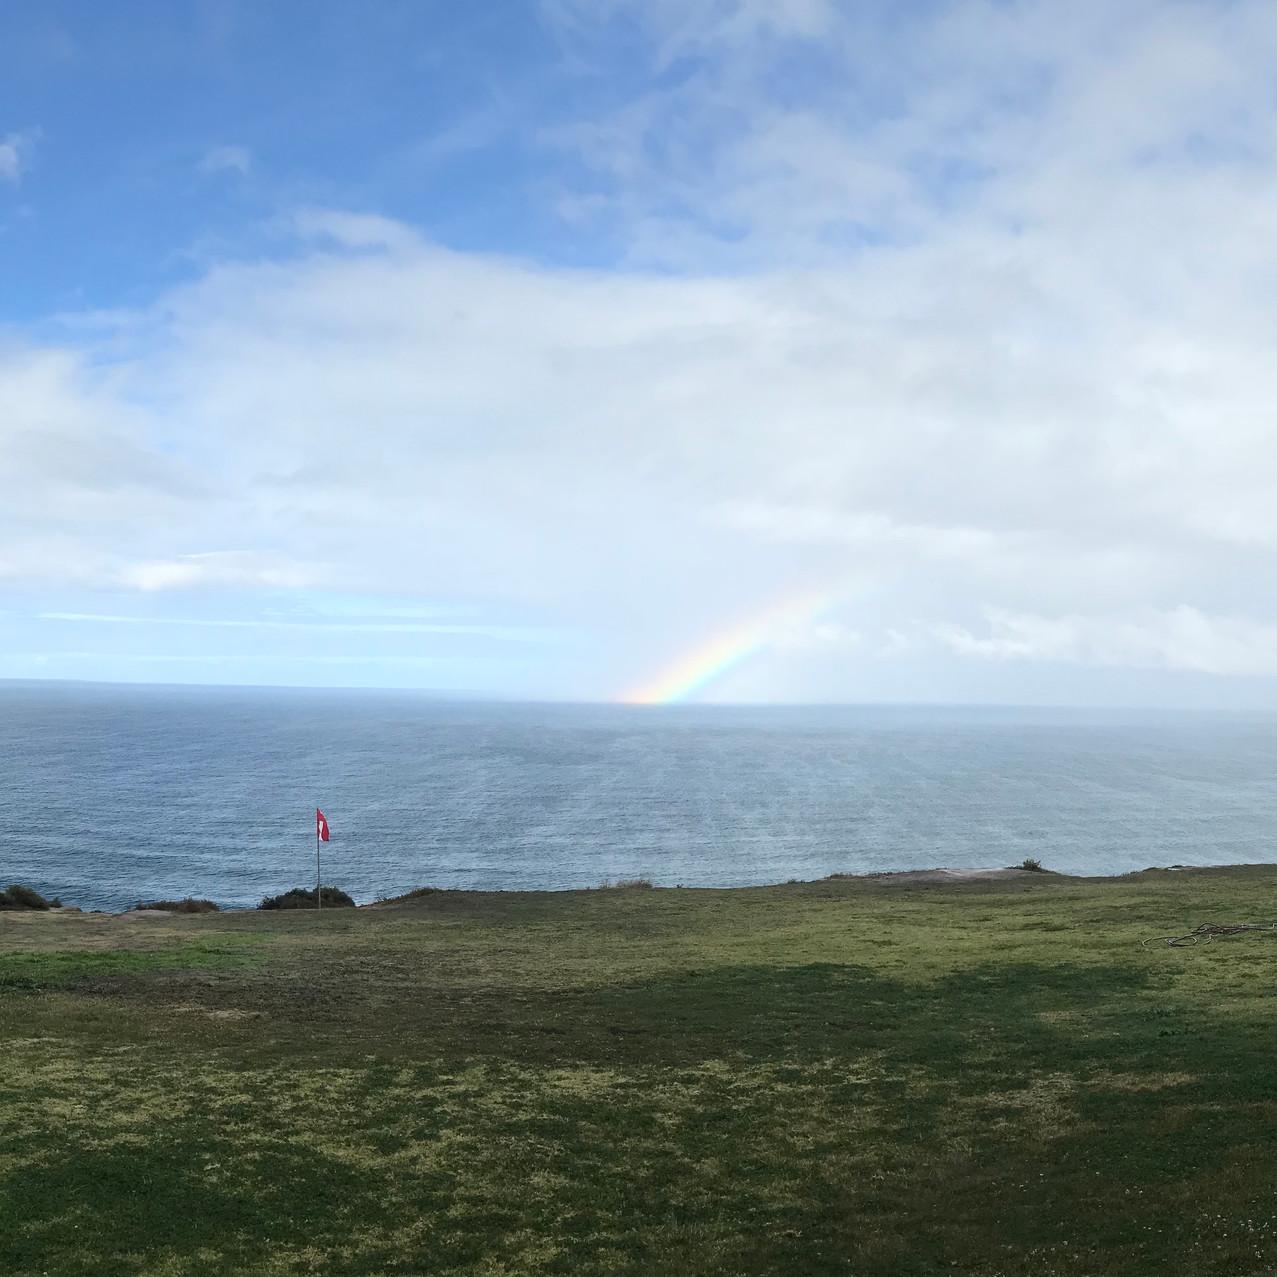 Rainbow morning at Torrey Pines Glid